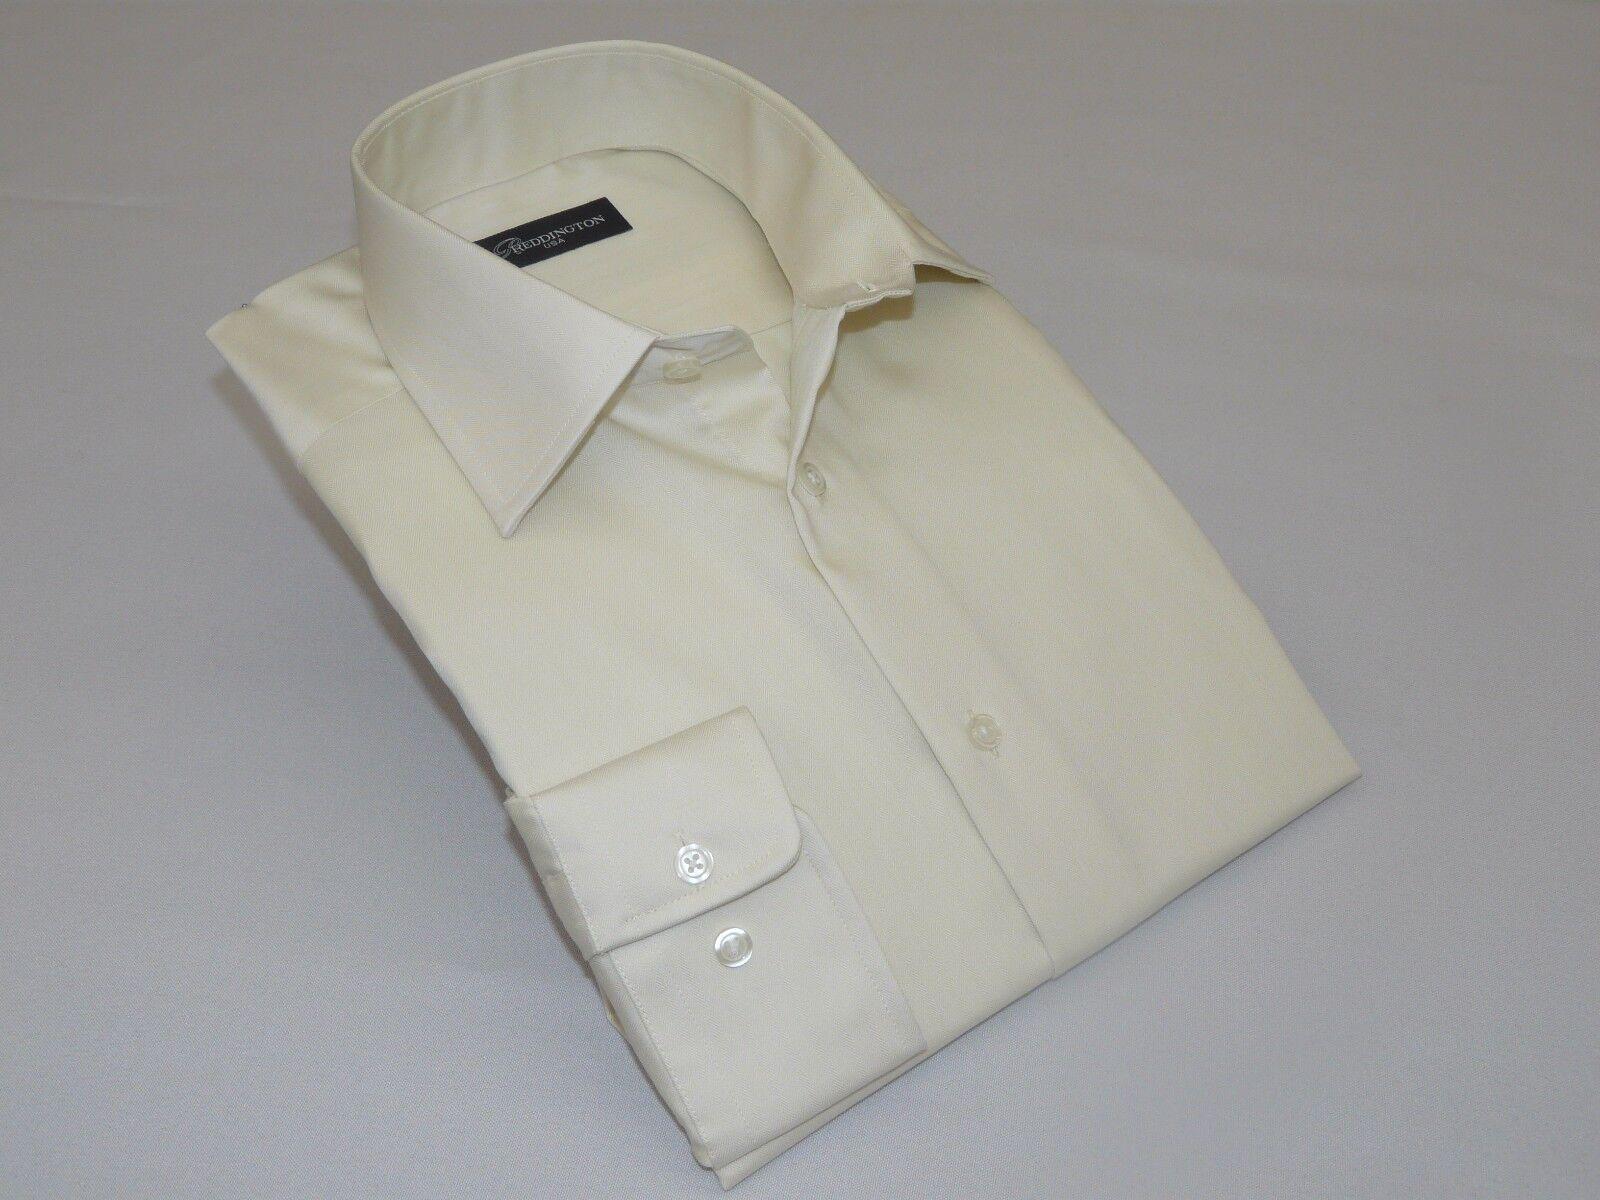 Mens REDDINGTON 100% Satin Cotton Shirt Barrel Cuffs Wrinkle resistance A9 Ivory